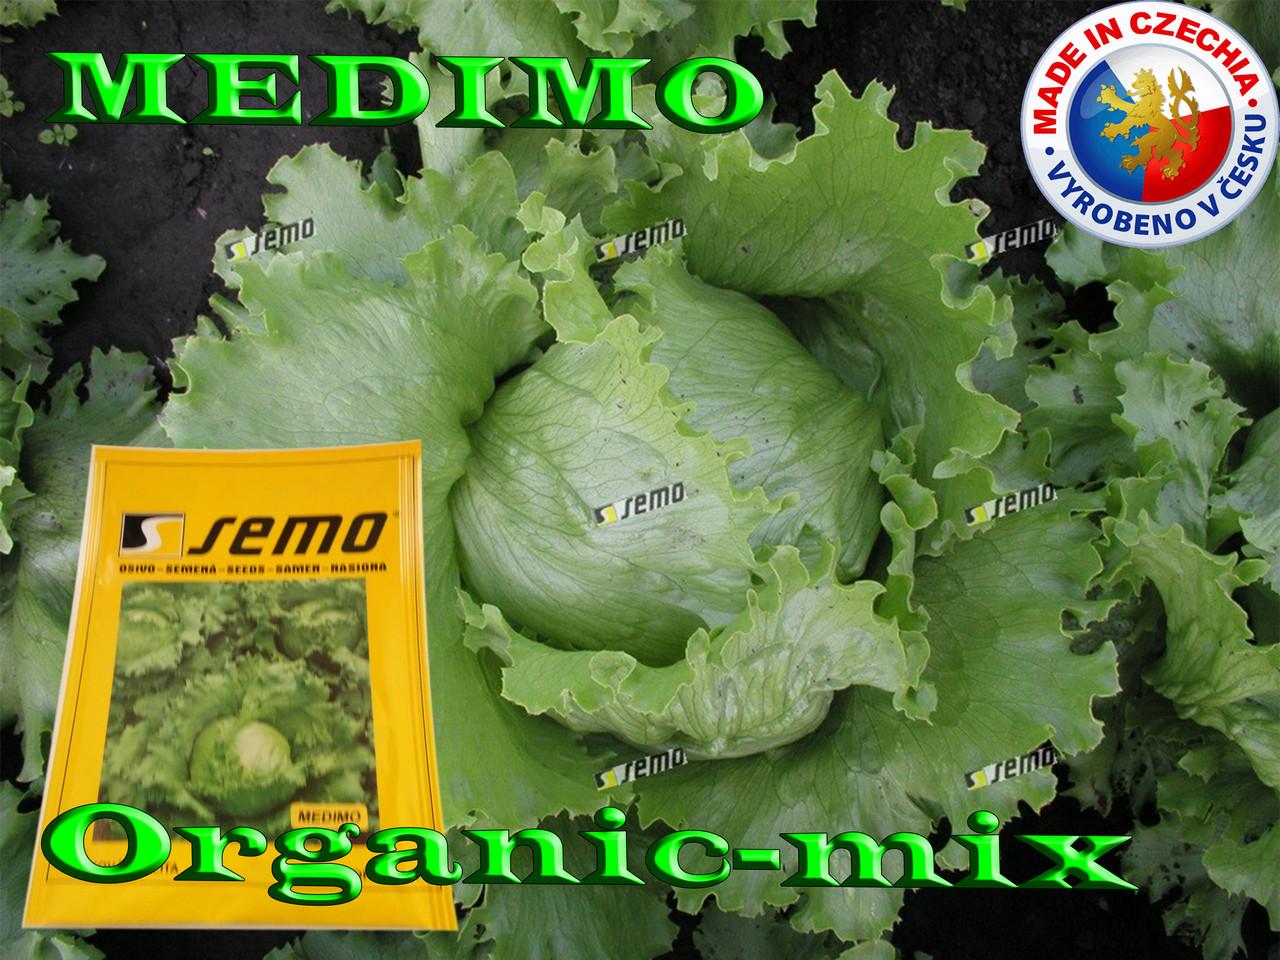 Салат кочанный МЕДИМО / MEDIMO ТМ SEMO (Чехия) проф. пакет 1 грамм